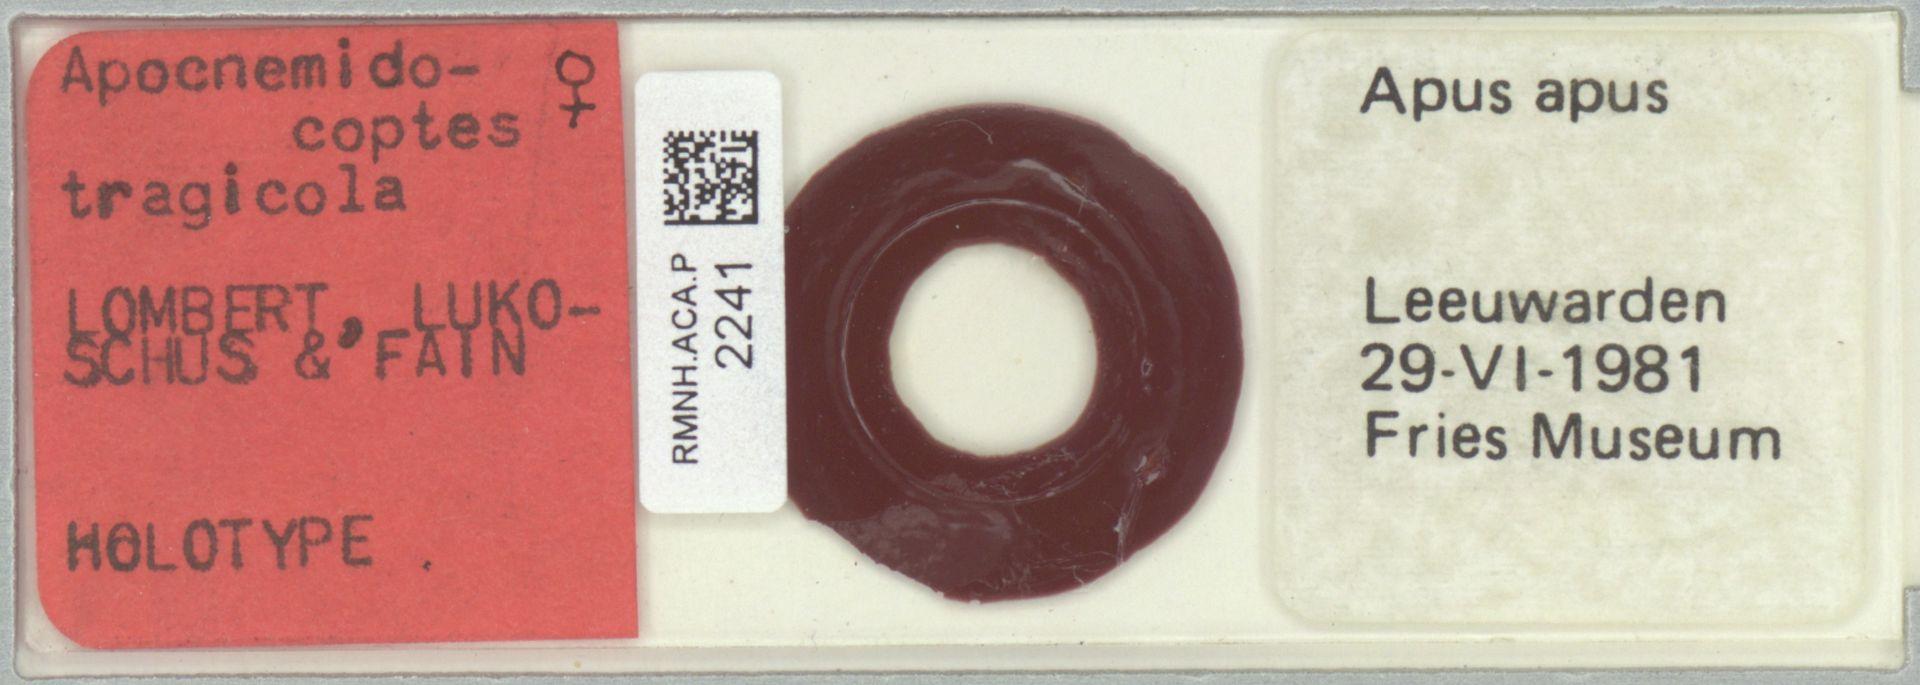 RMNH.ACA.P.2241 | Apocnemidocoptes tragicola Lombert, Lukoschus & Fain